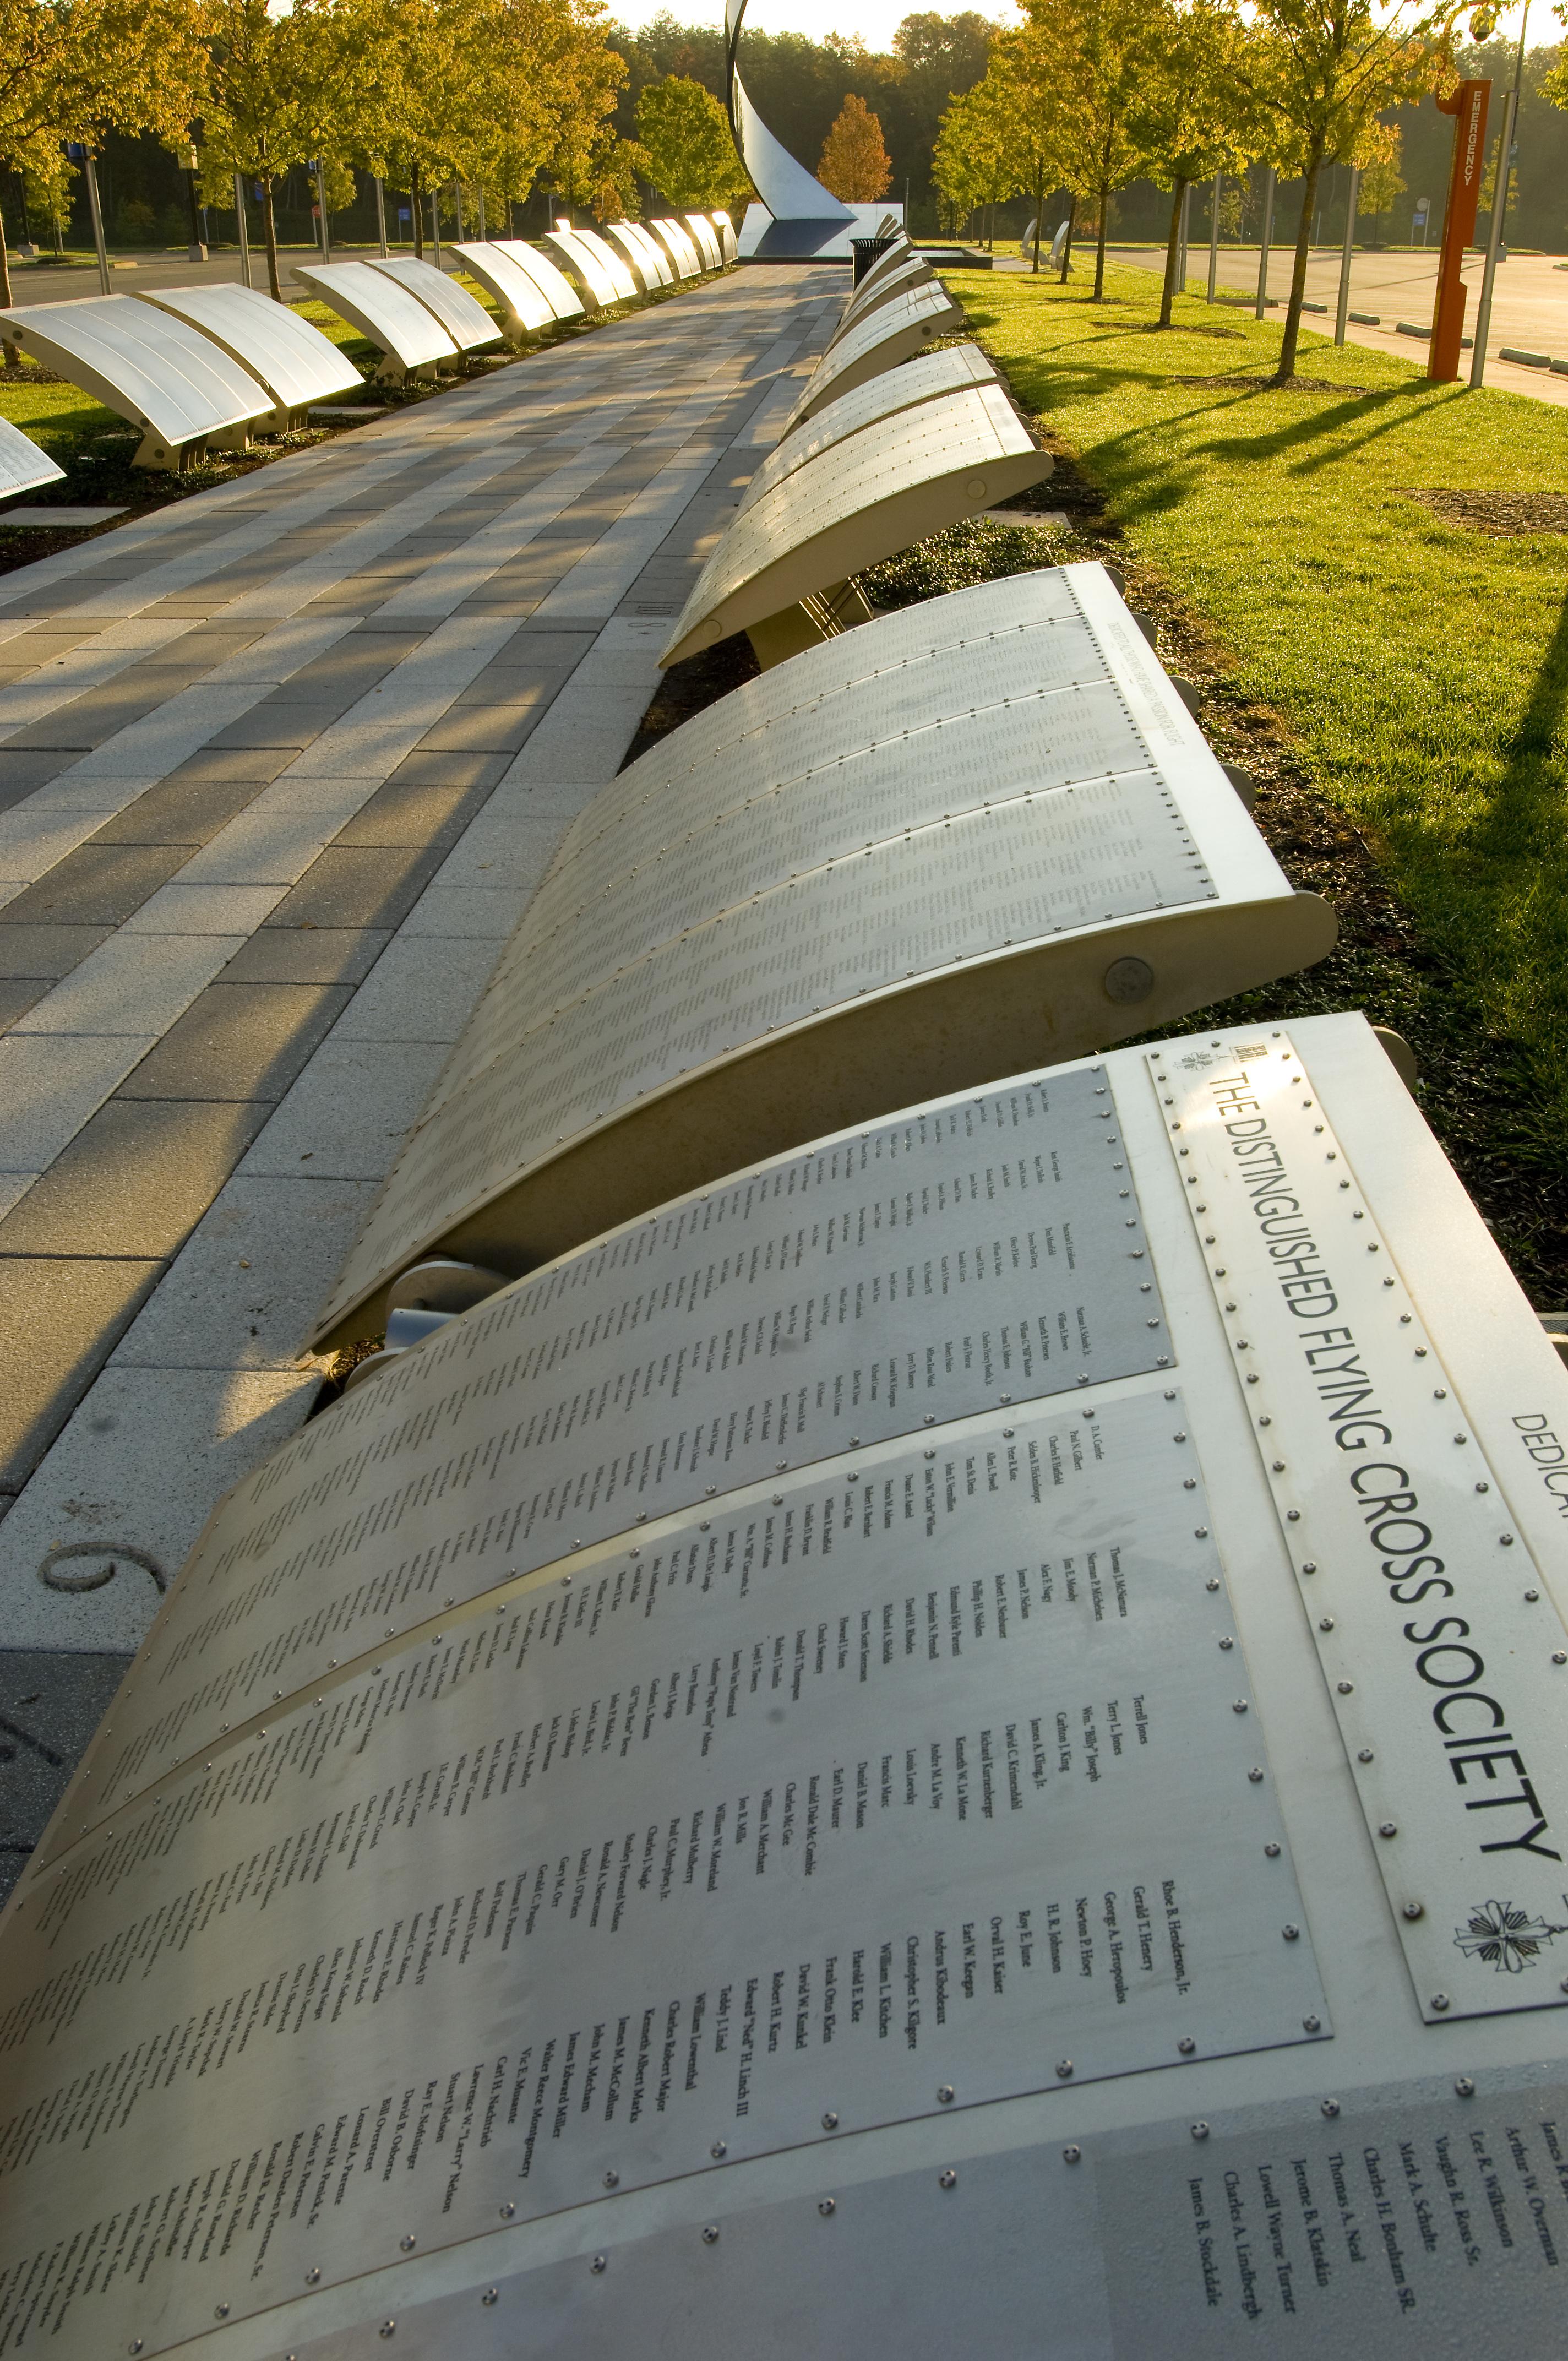 Wall of Honor at the Udvar-Hazy Center